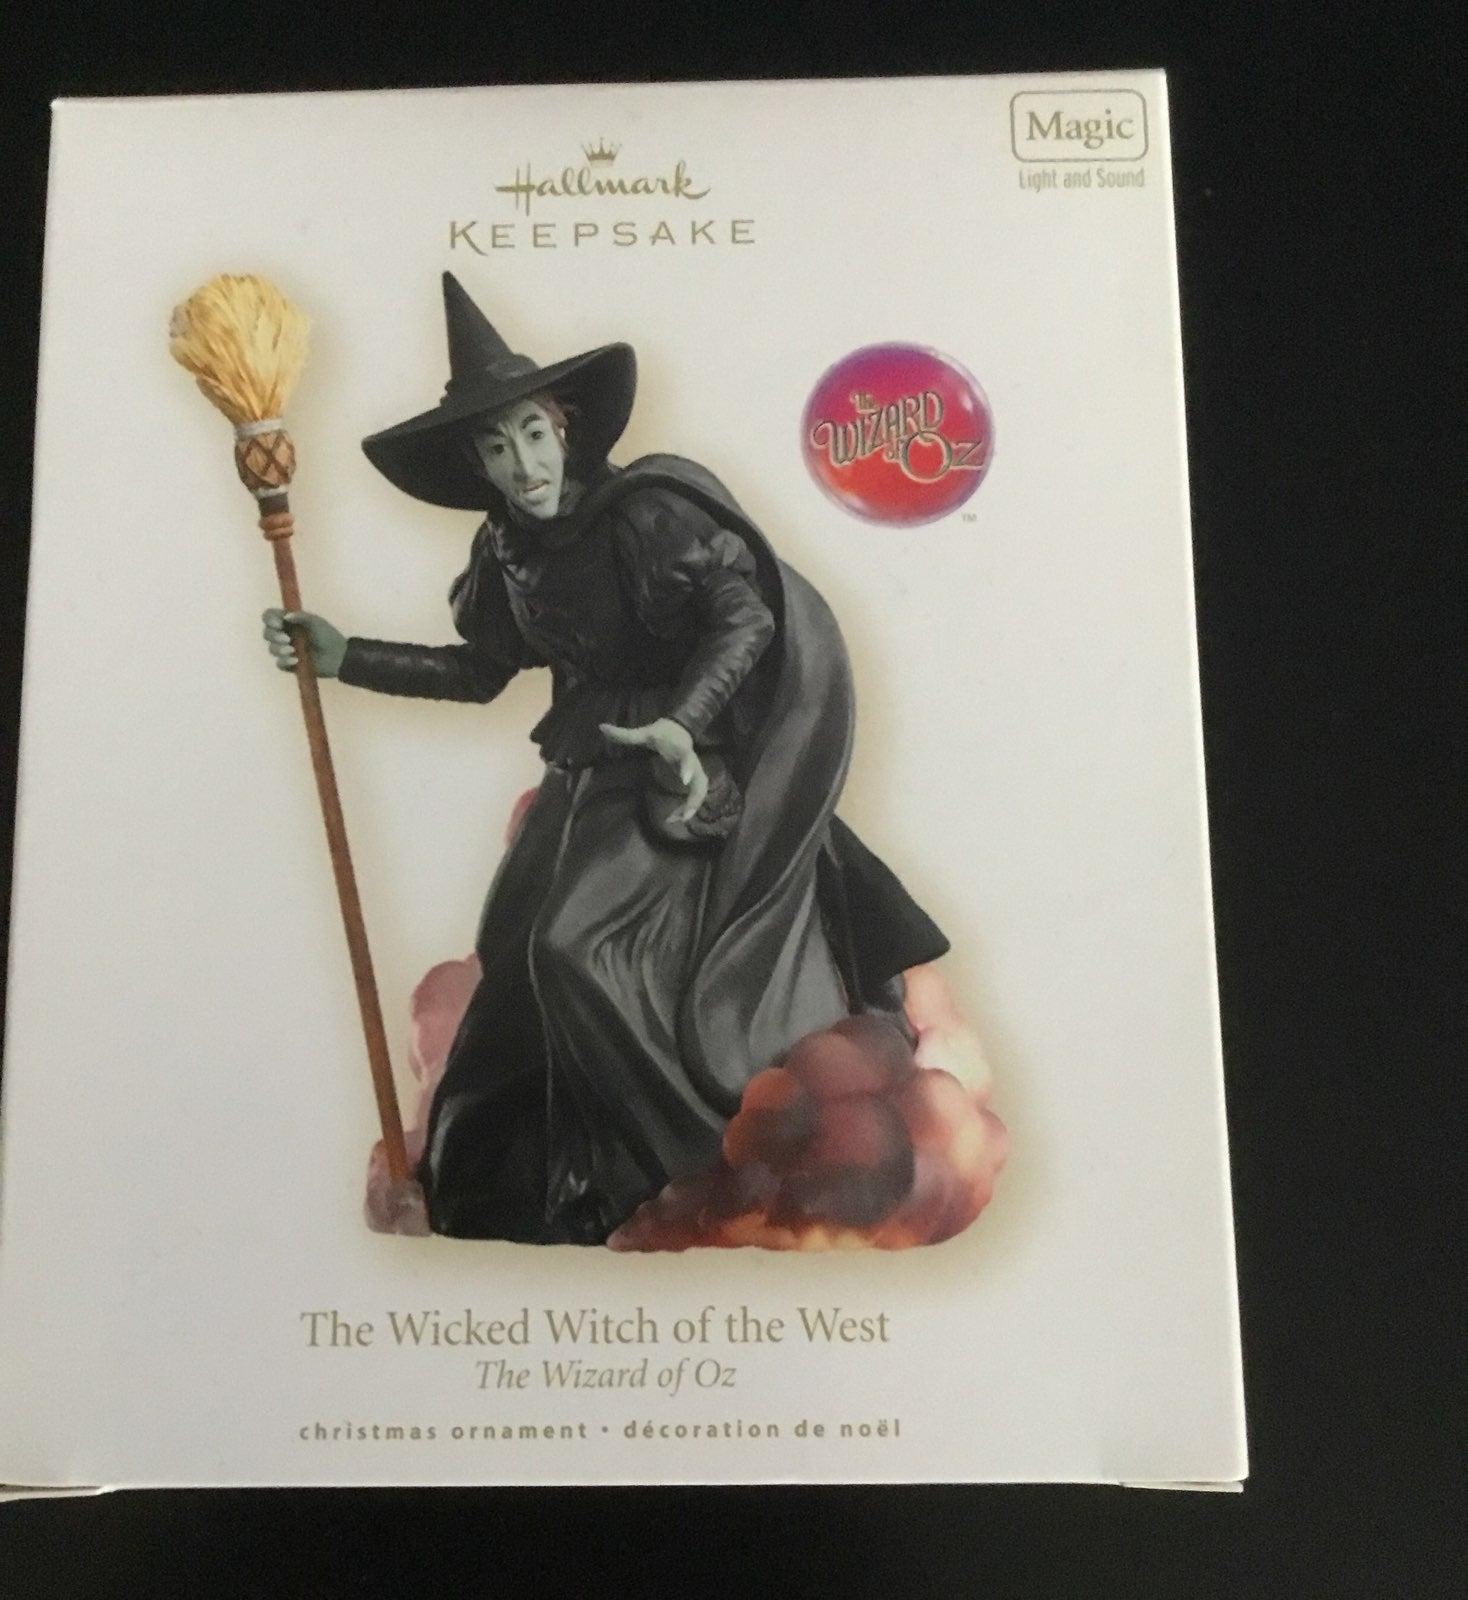 wizard of oz wicked witch ornament